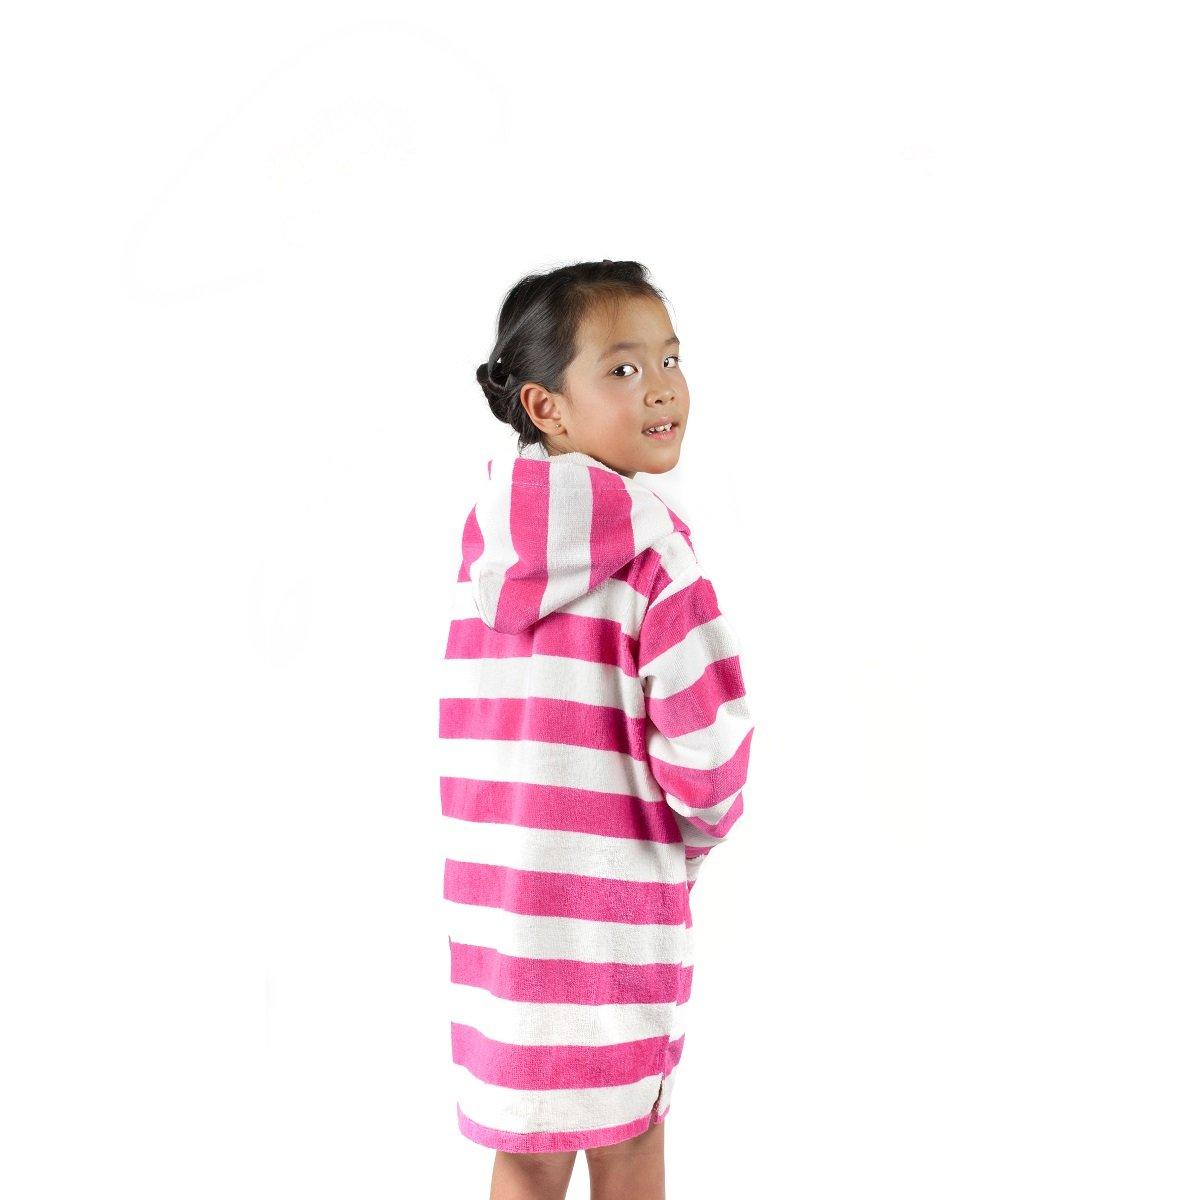 299f0dede1b Ladies Towelling Beach Dress Uk - Data Dynamic AG